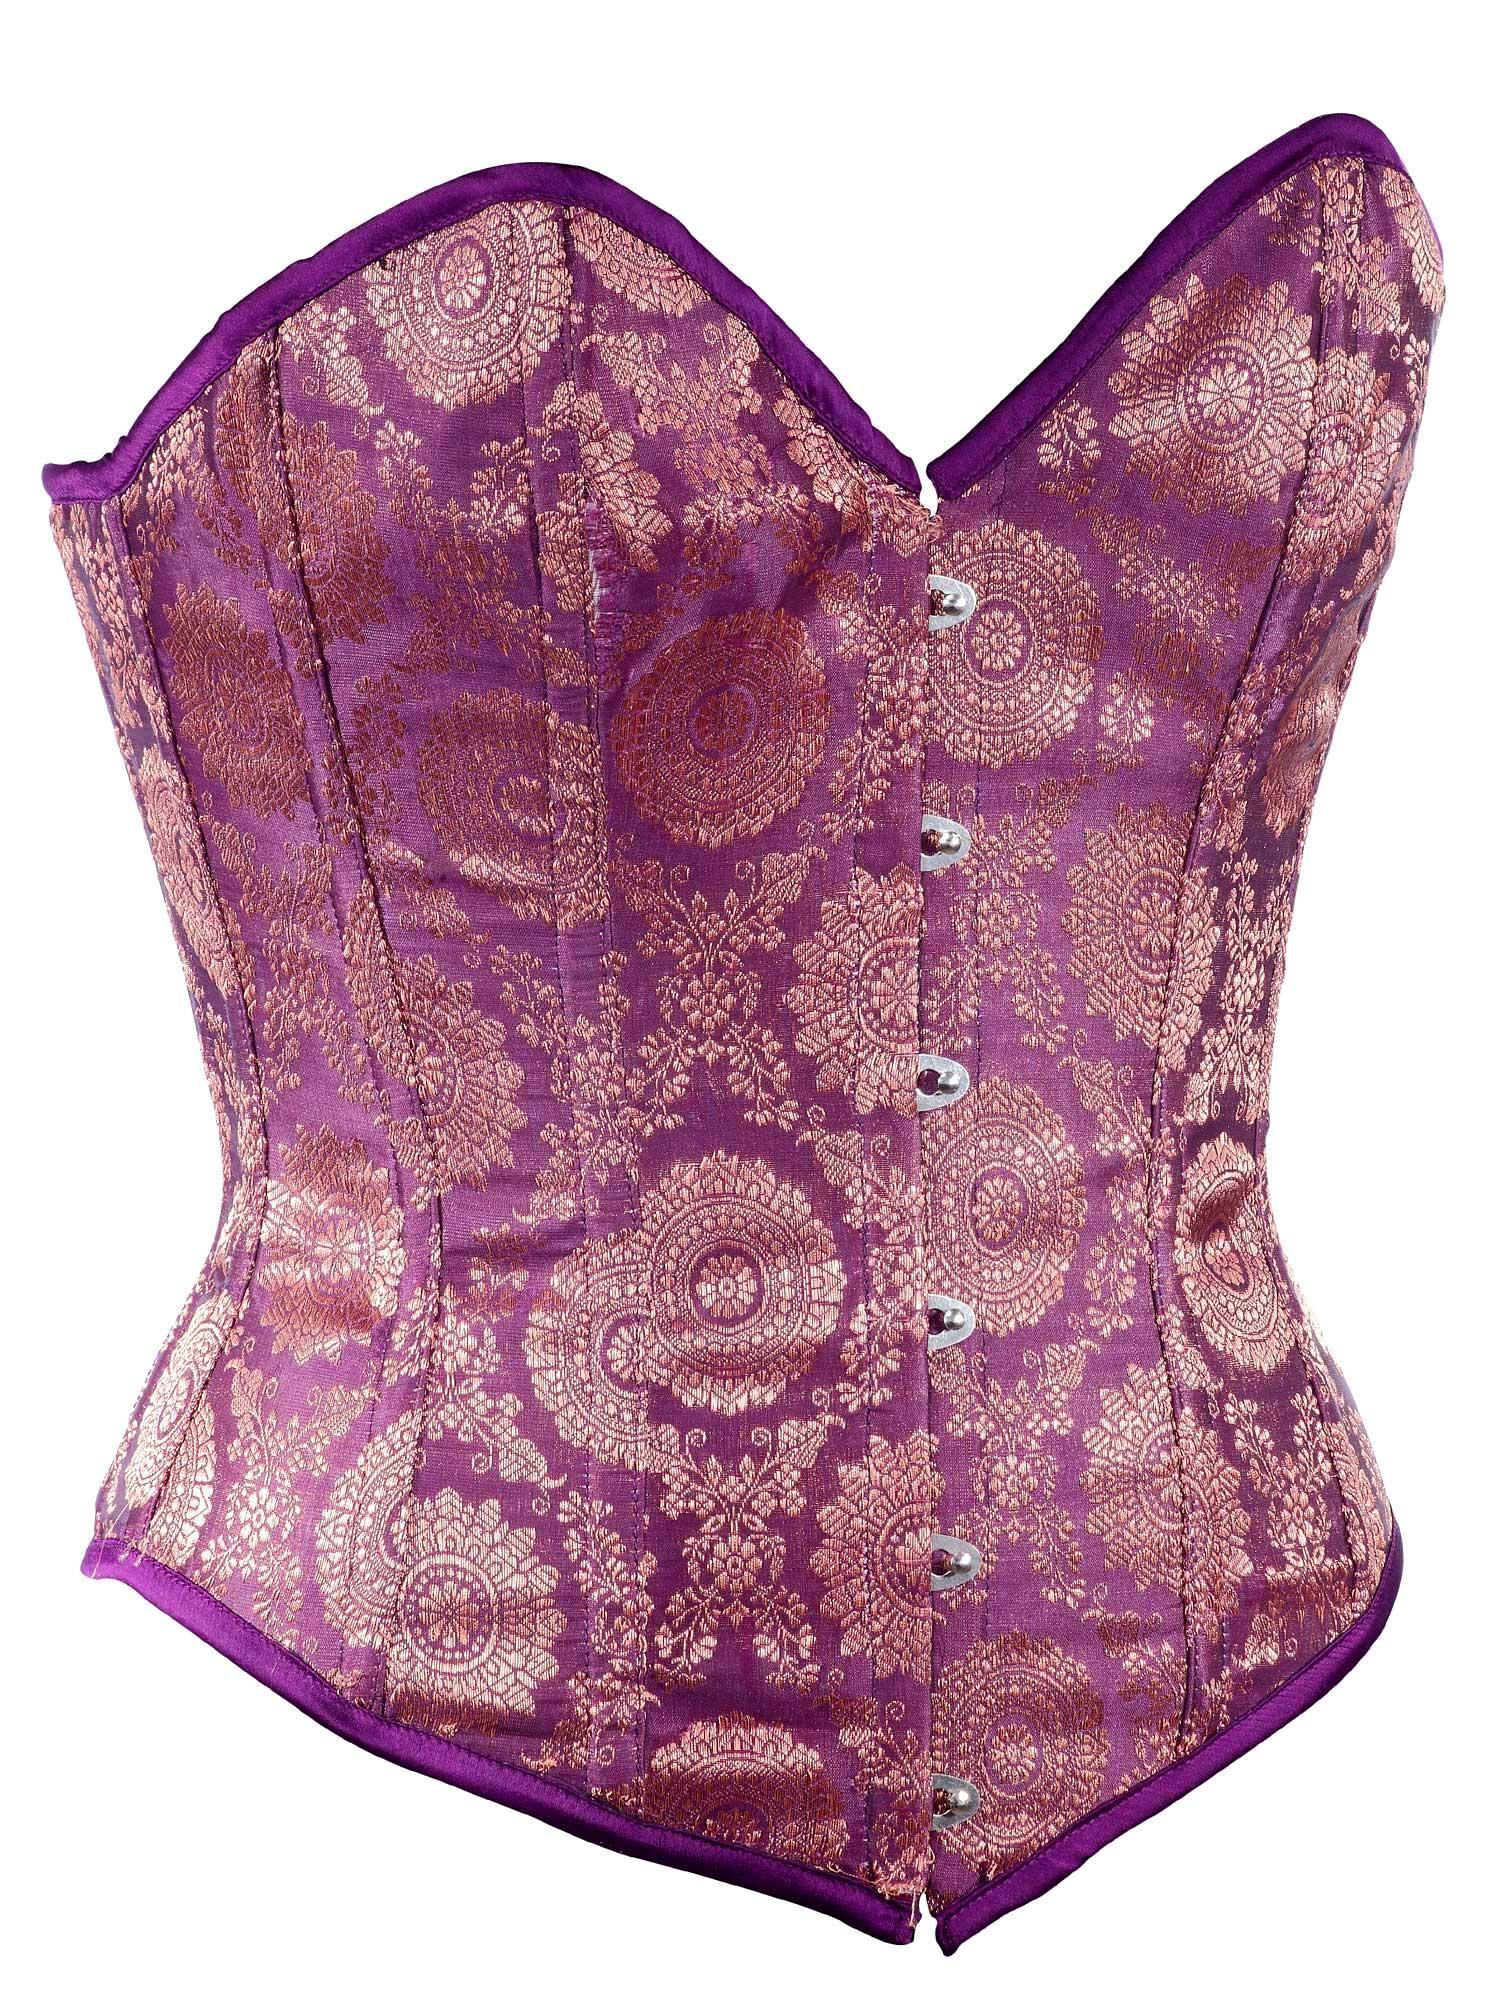 purple_ethnic_indian_fabric_steel_boning_corset_waist_cincher_bustier_bustiers_and_corsets_5.jpg